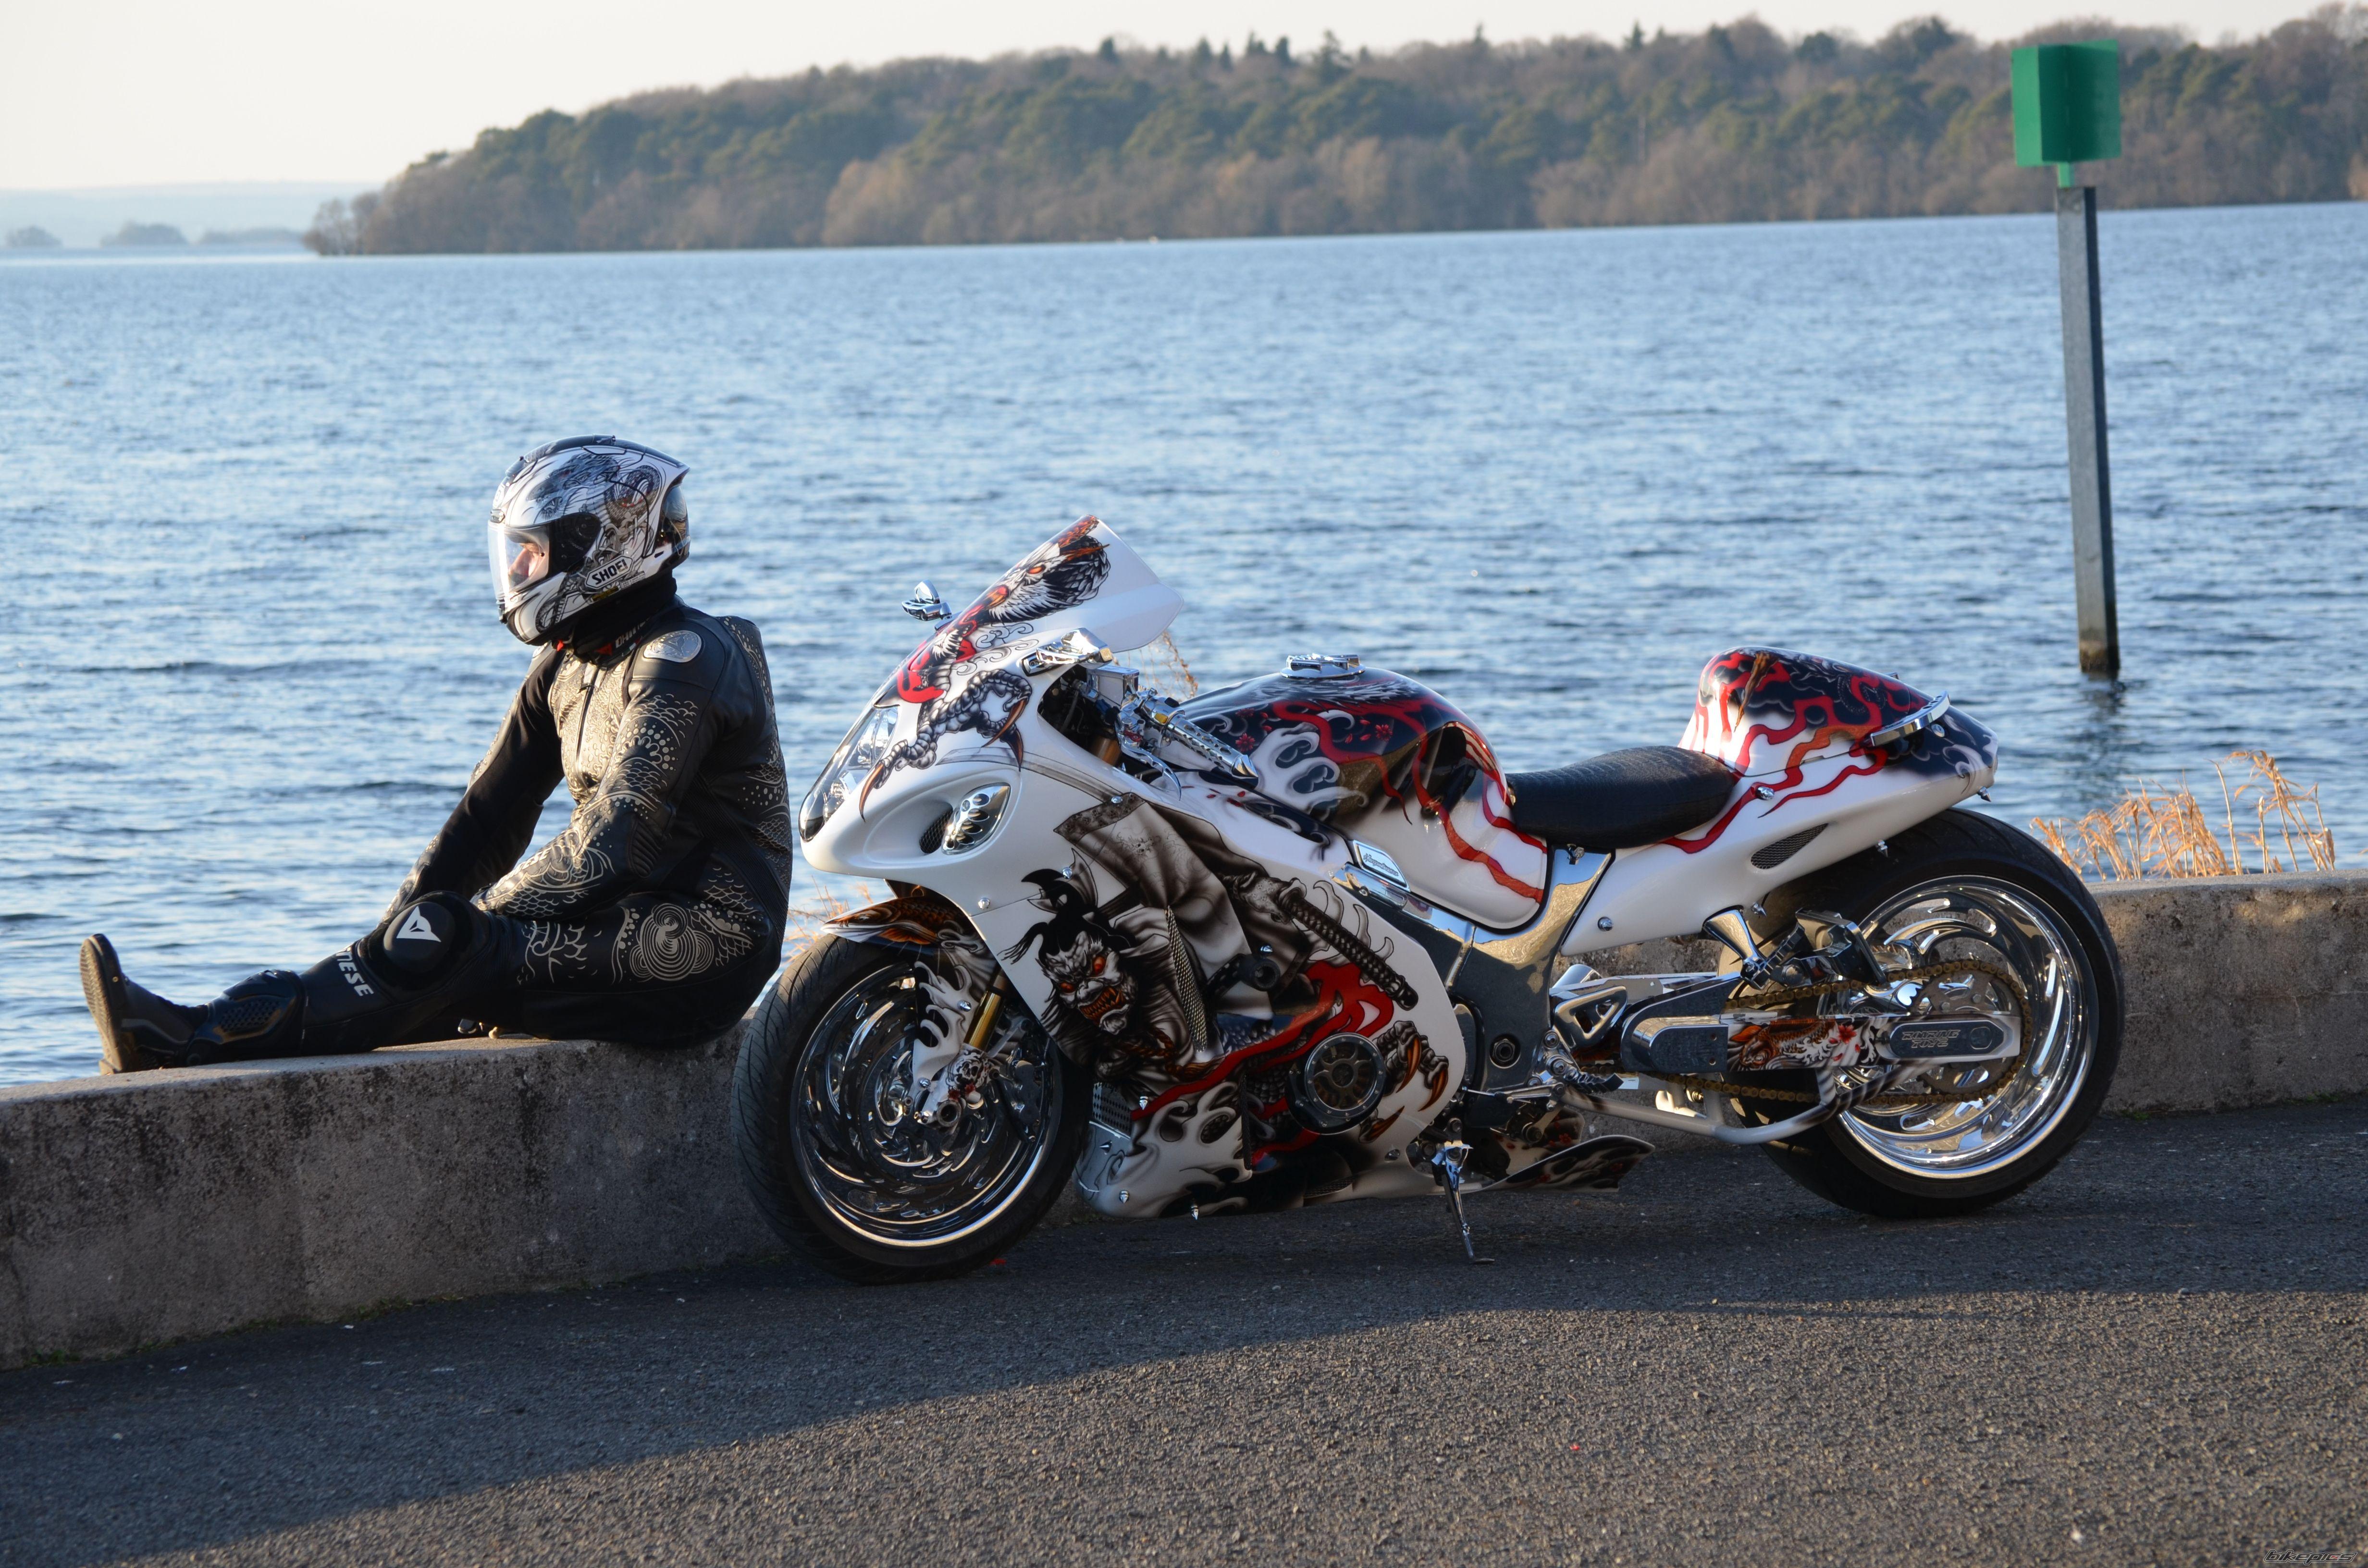 hayabusa tuning motorbikes 2560 - photo #8